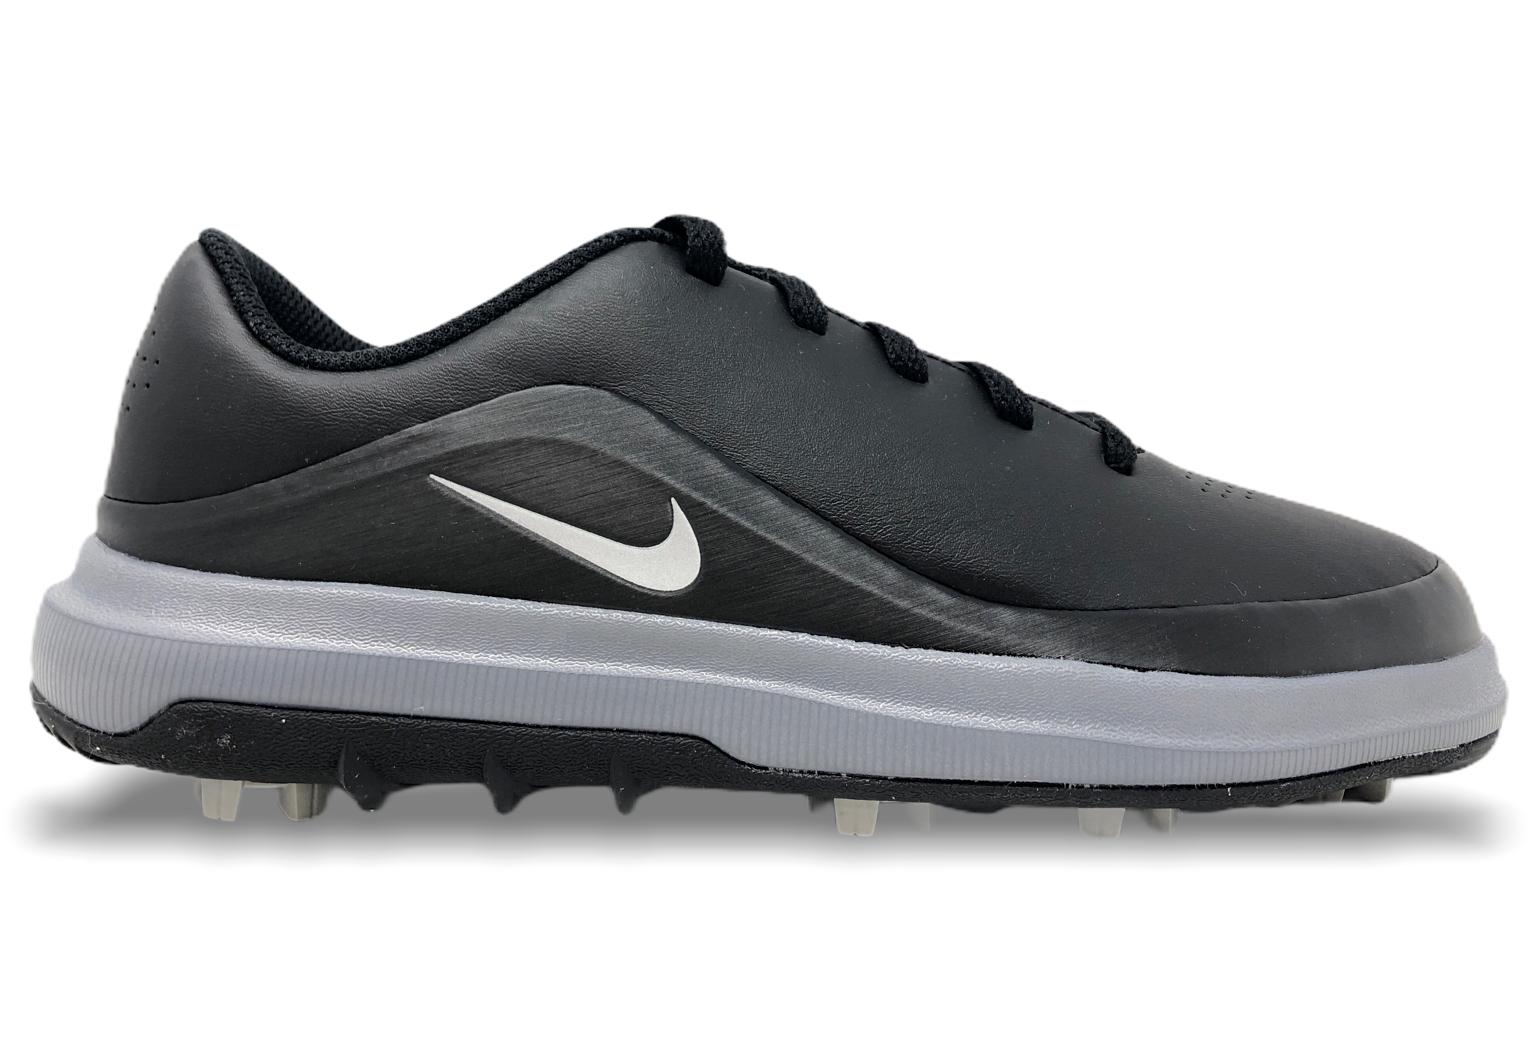 Kids Nike Precision Jr Golf Shoes Black Metallic Silver Youth Sizes 909251 002 For Sale Online